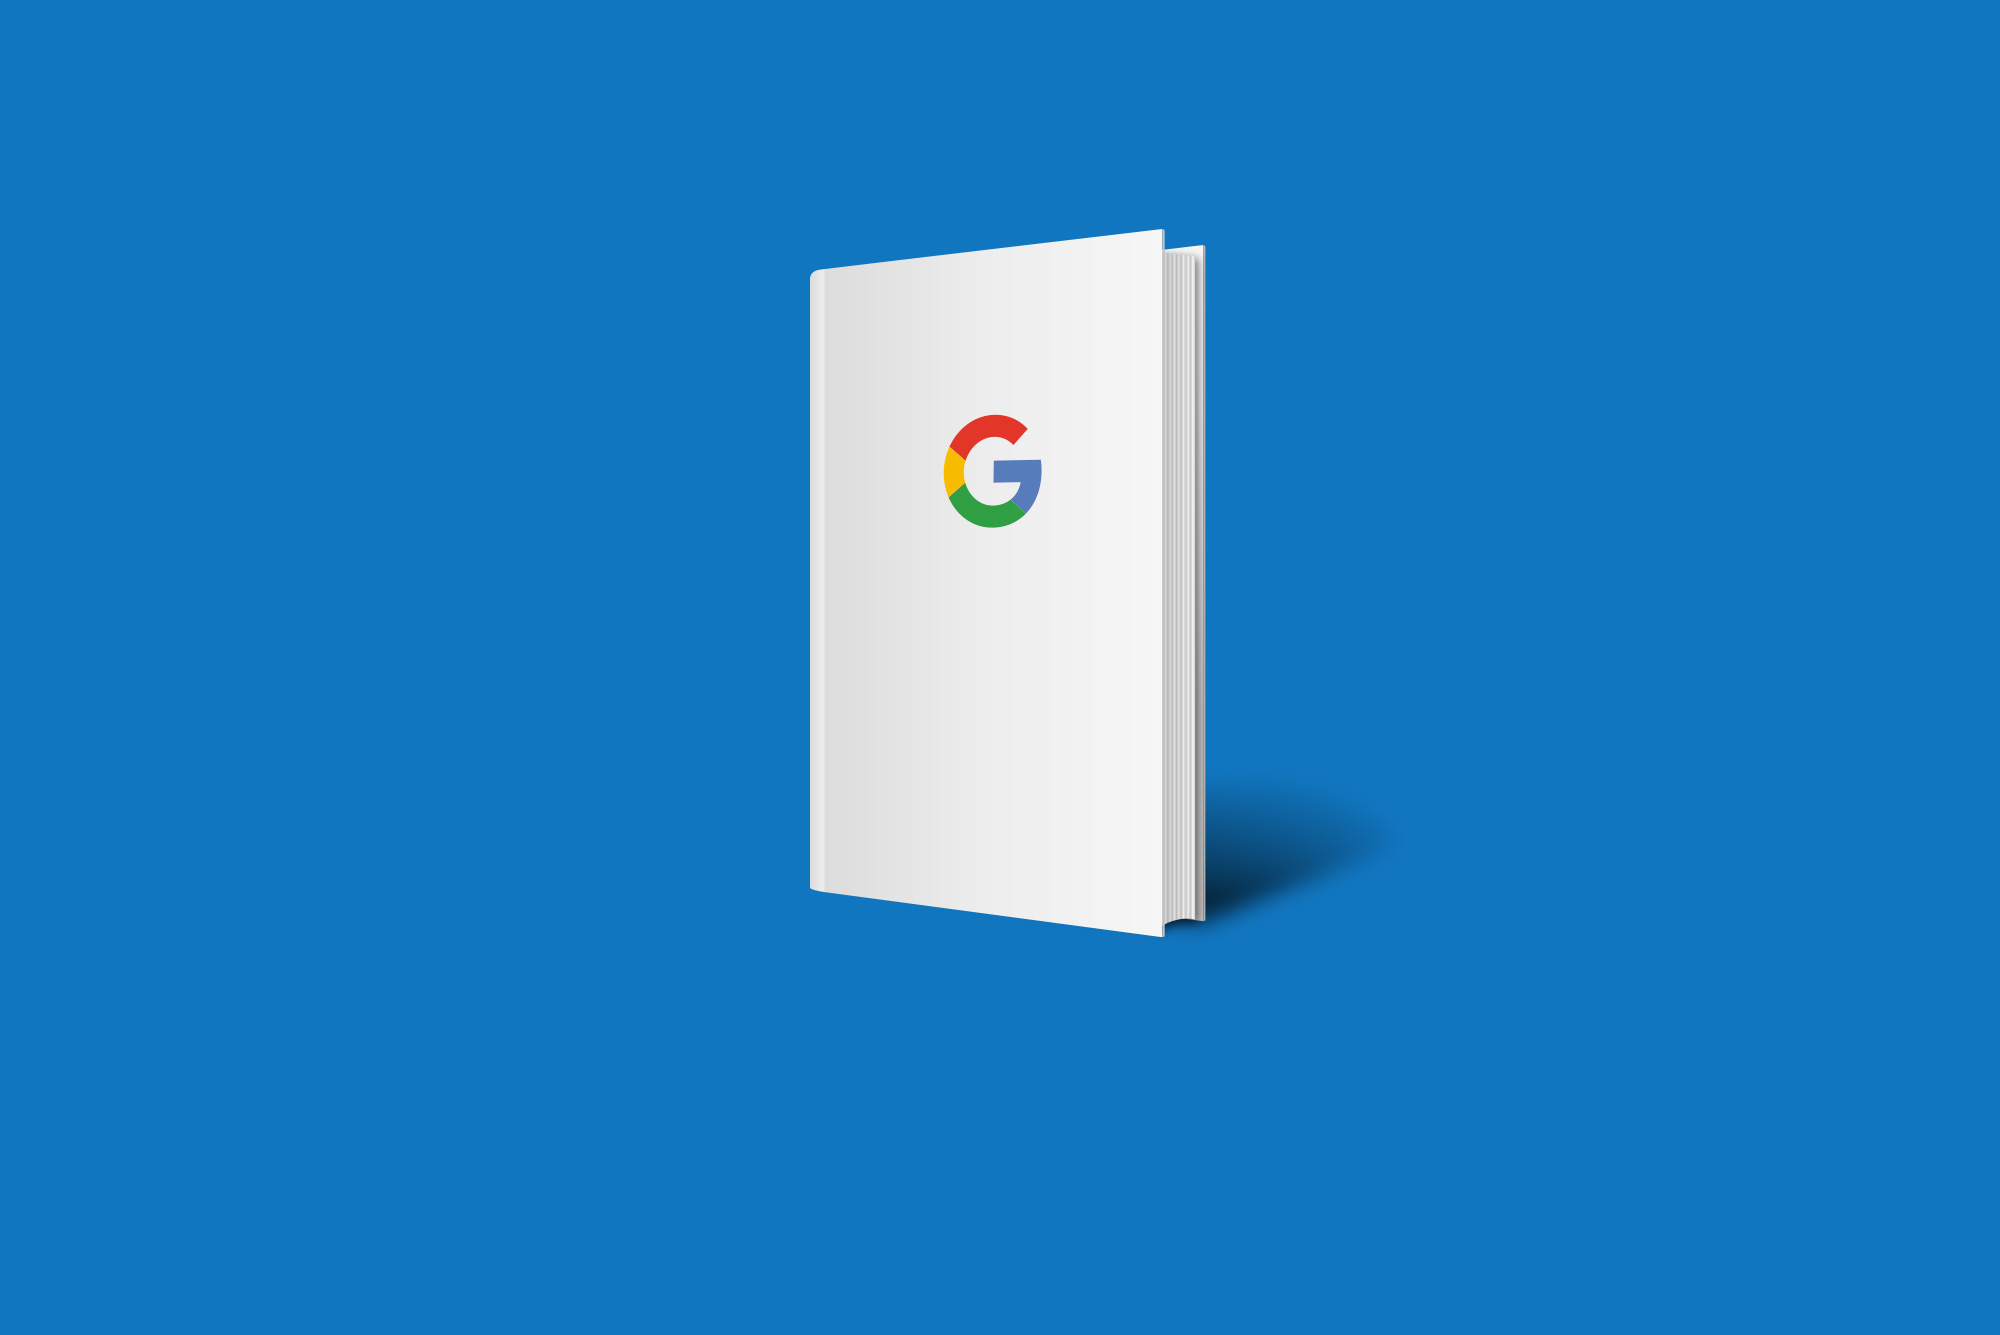 Google book on blue background - Website guidelines